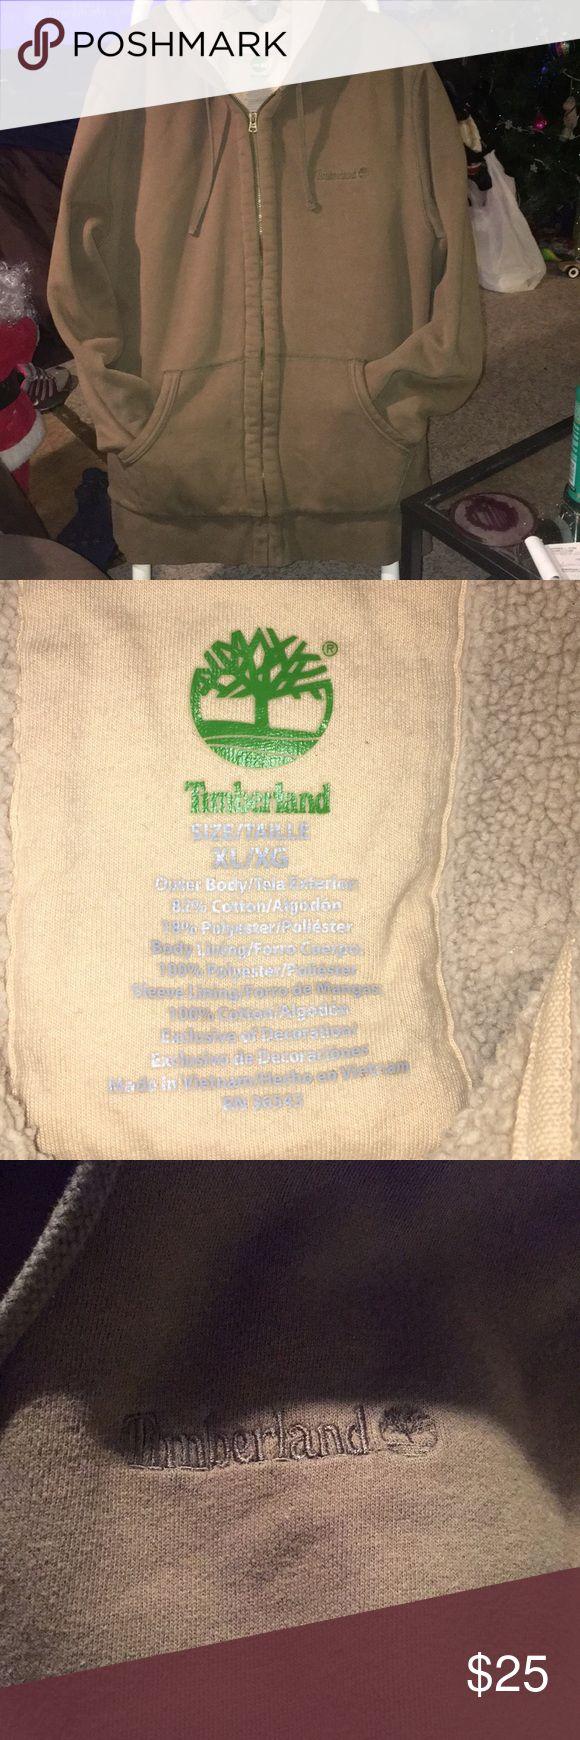 ❤️TIMBERLAND HOODIE Gently used really nice Sherpa lines super warm Timberland Shirts Sweatshirts & Hoodies